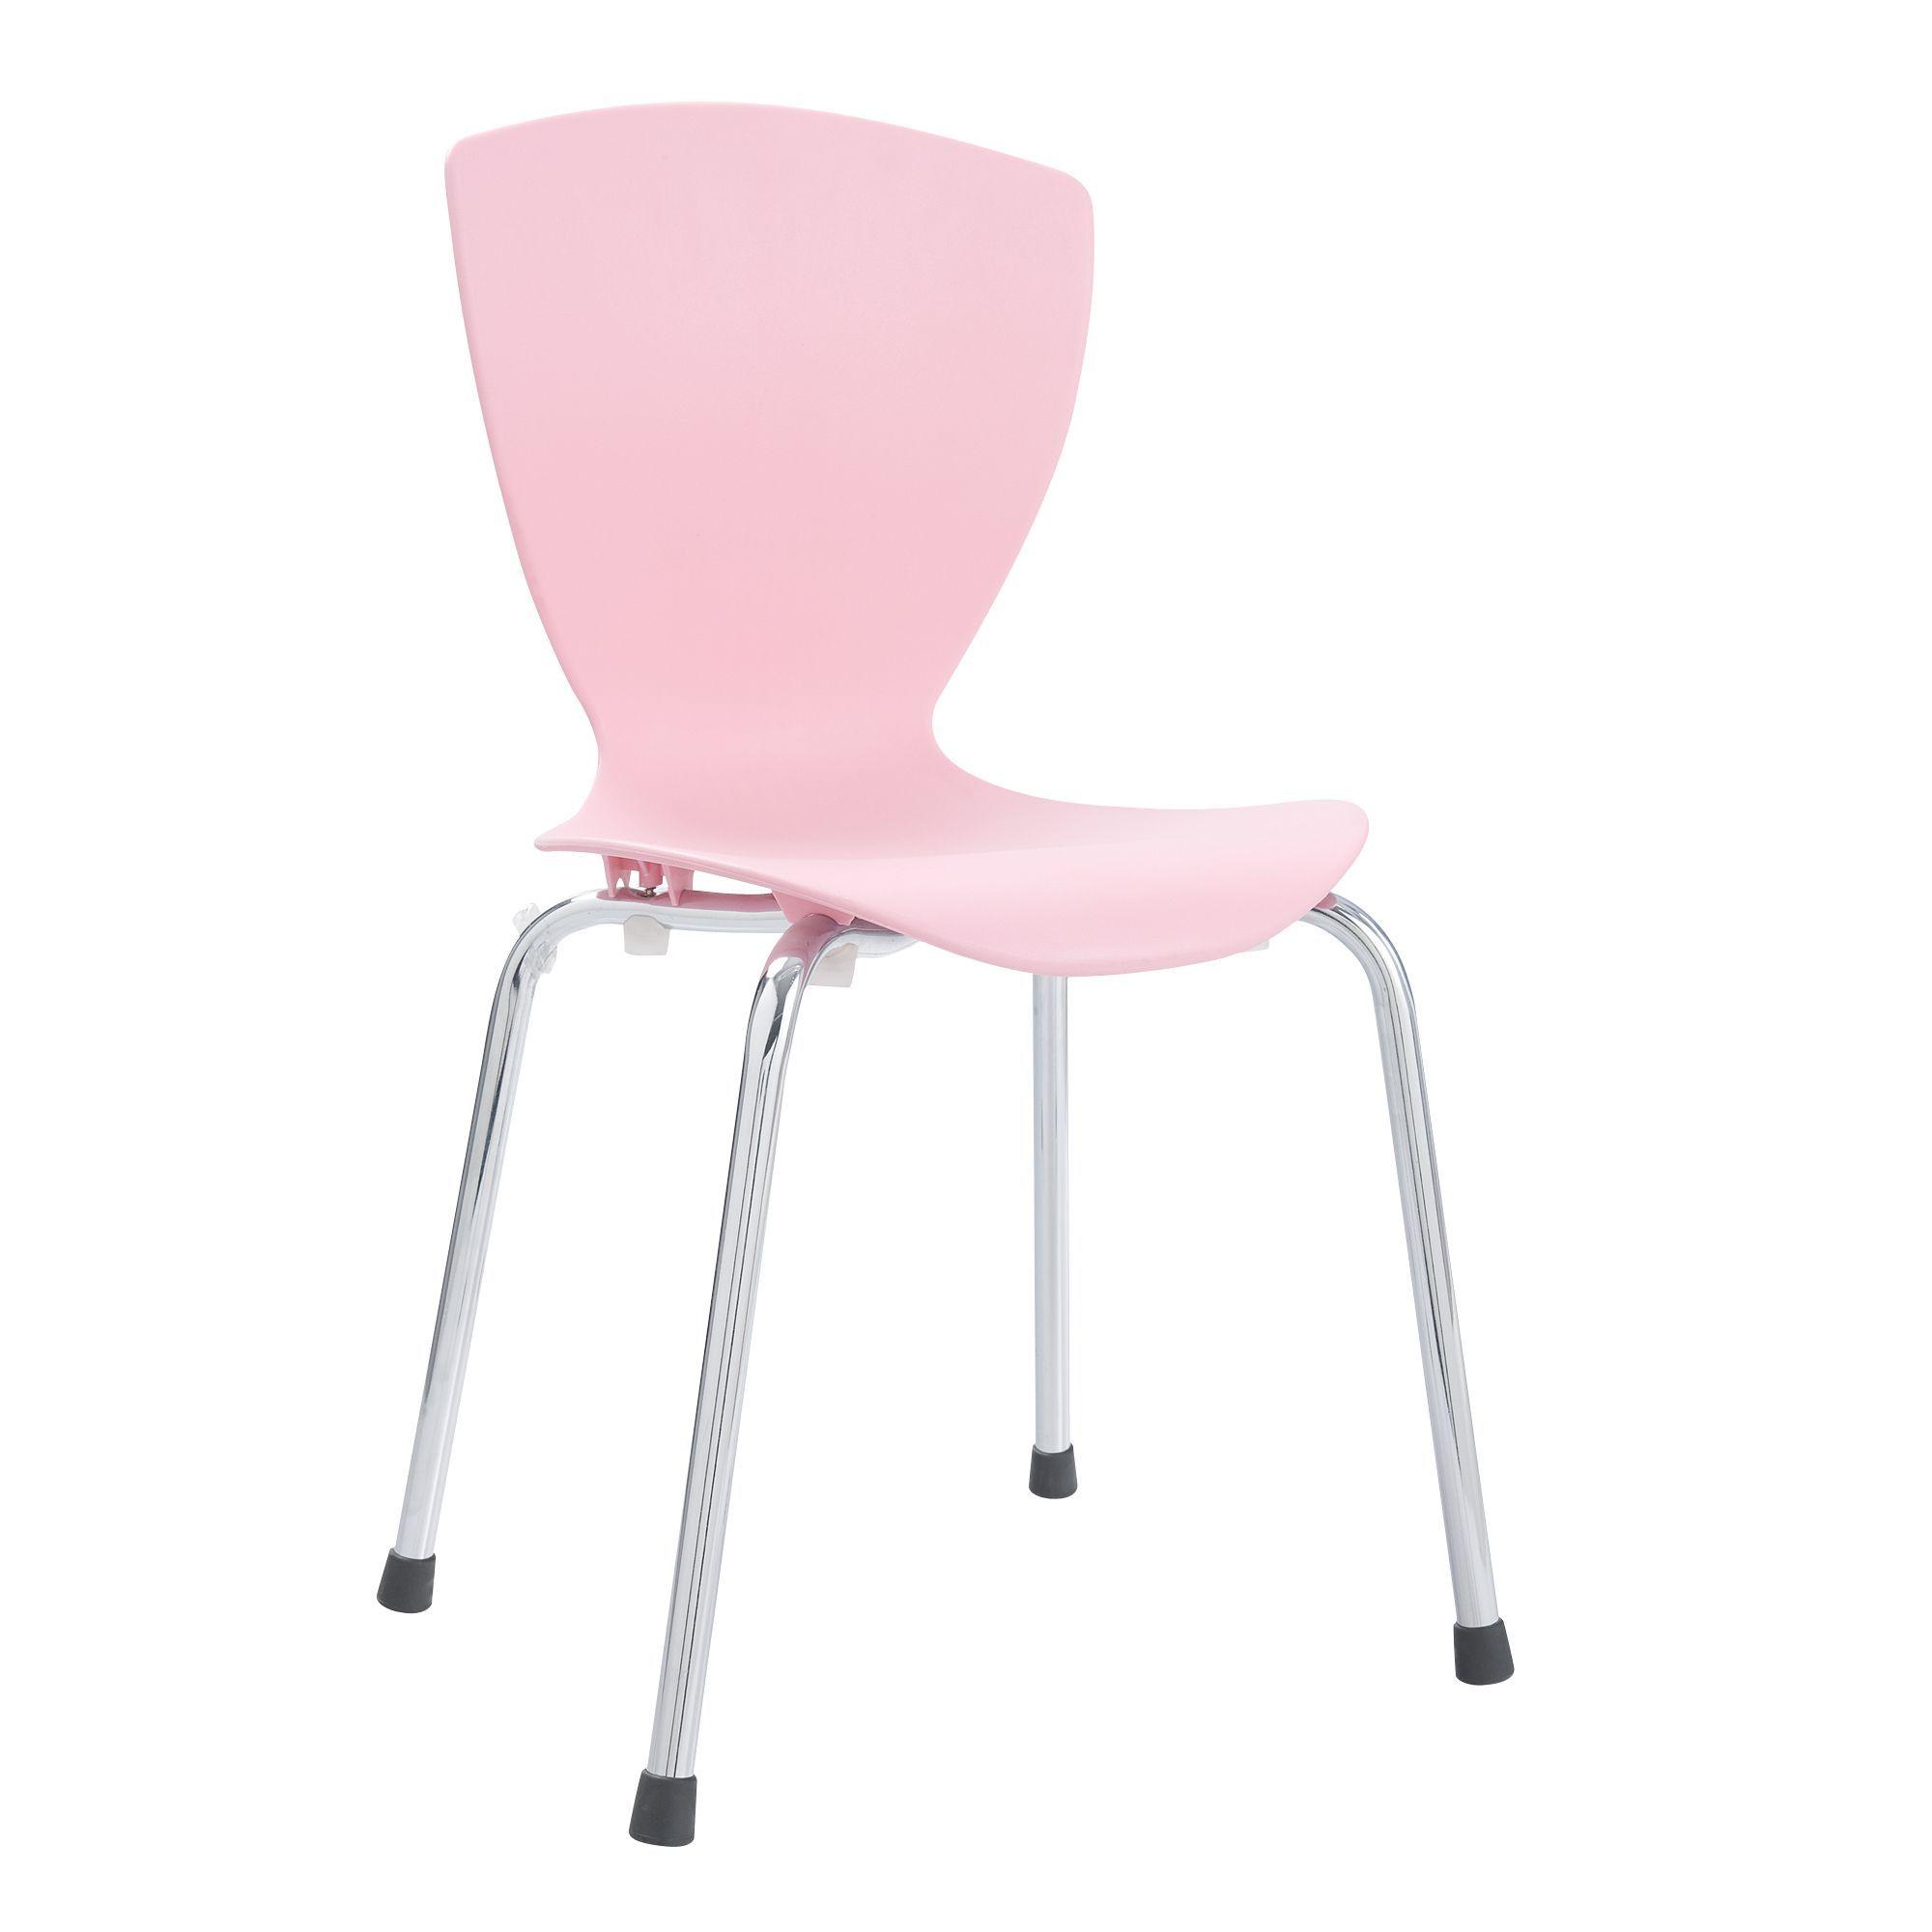 good gordon chaise alinea with chaise alinea. Black Bedroom Furniture Sets. Home Design Ideas